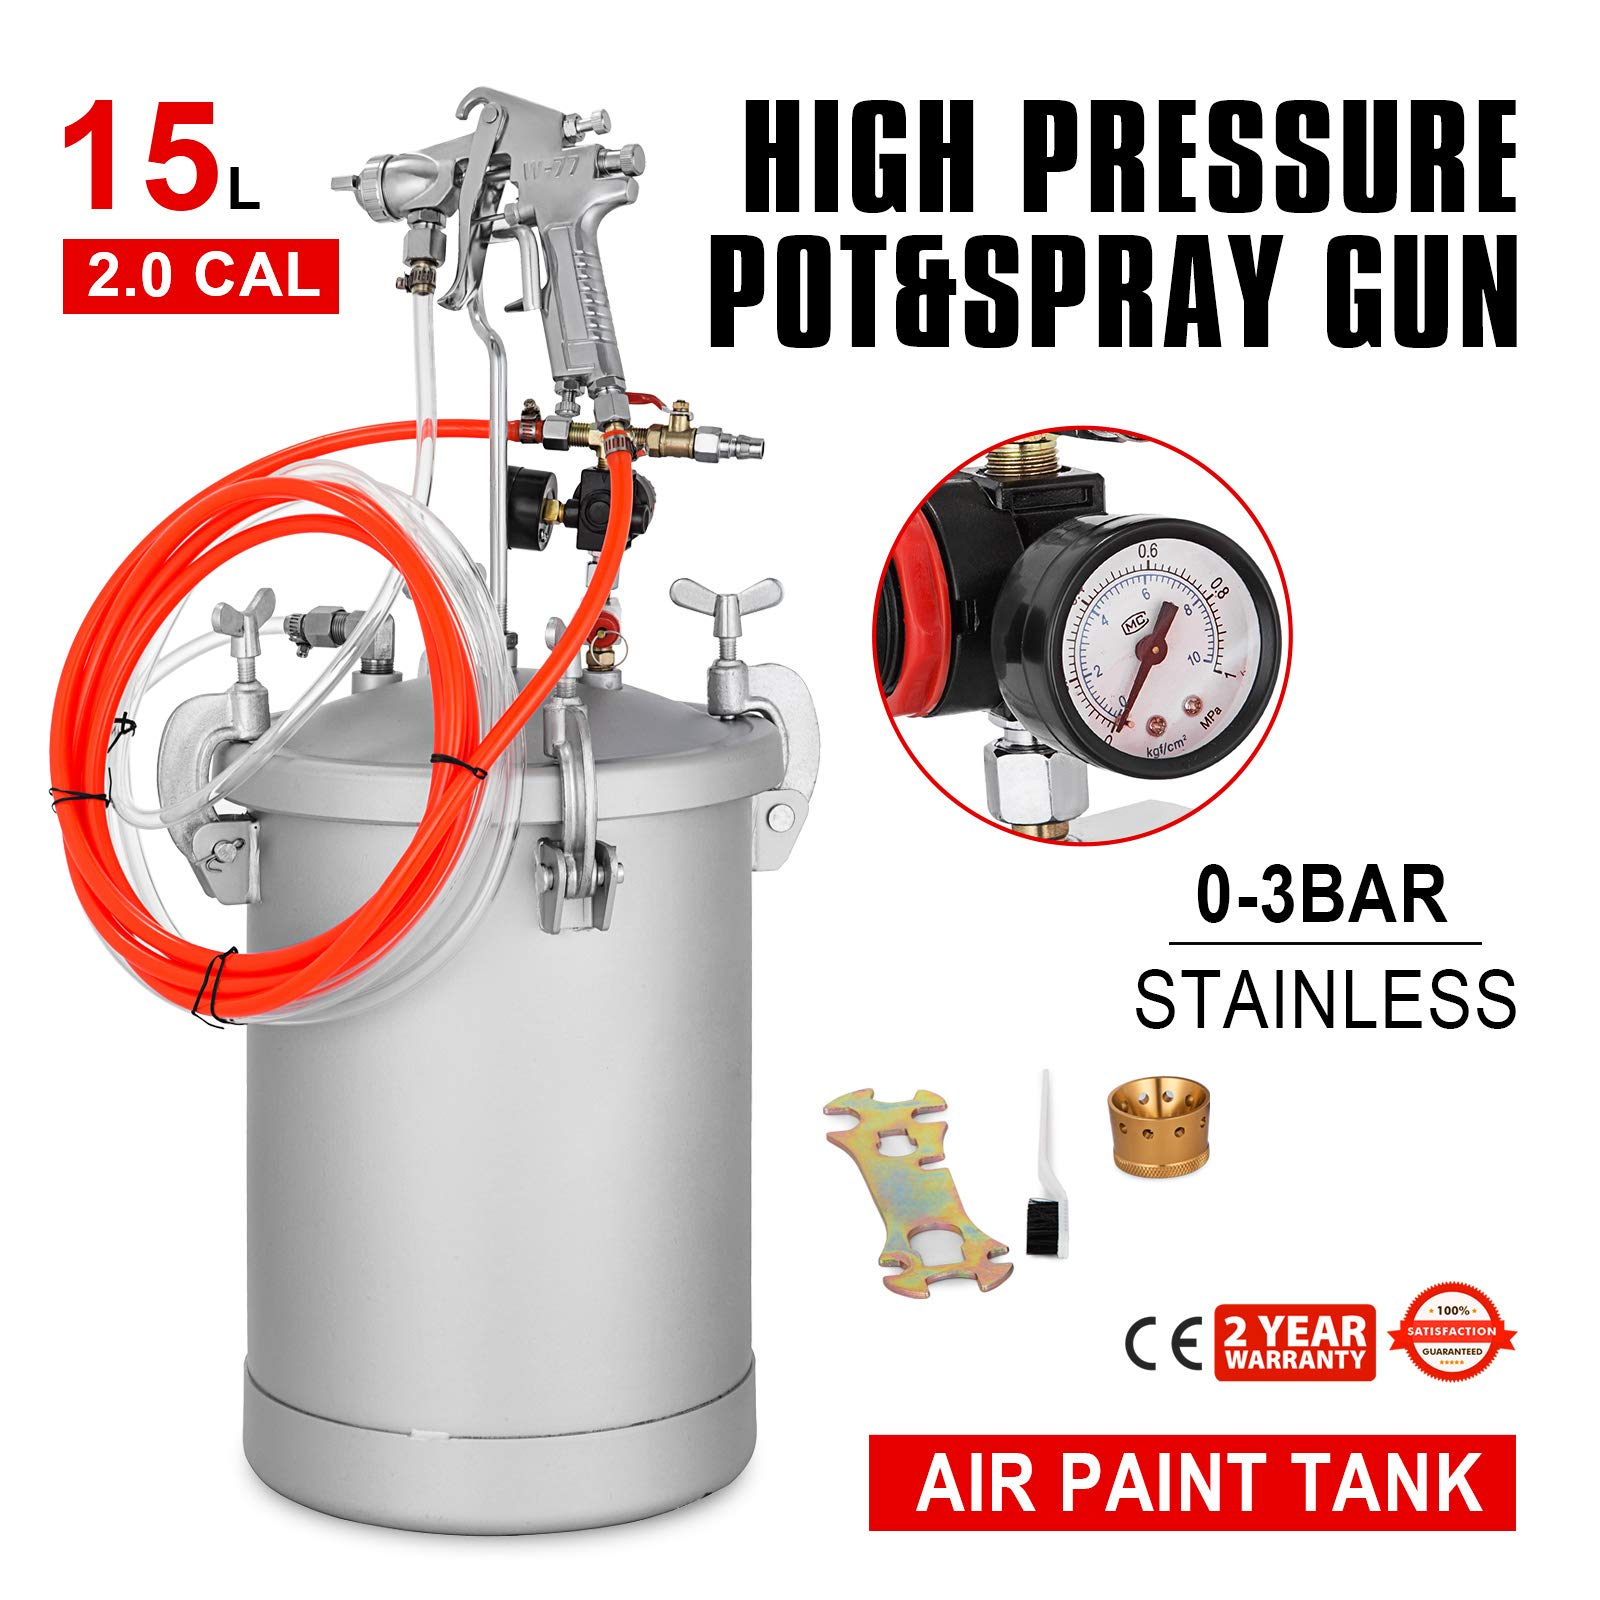 VEVOR Paint Tank 15L Pressure Pot Paint Sprayer 4 Gallon Pressure Spray Gun with 2.0mm Nozzle Regulator Industrial Painting Painter (15L 2.0mm)